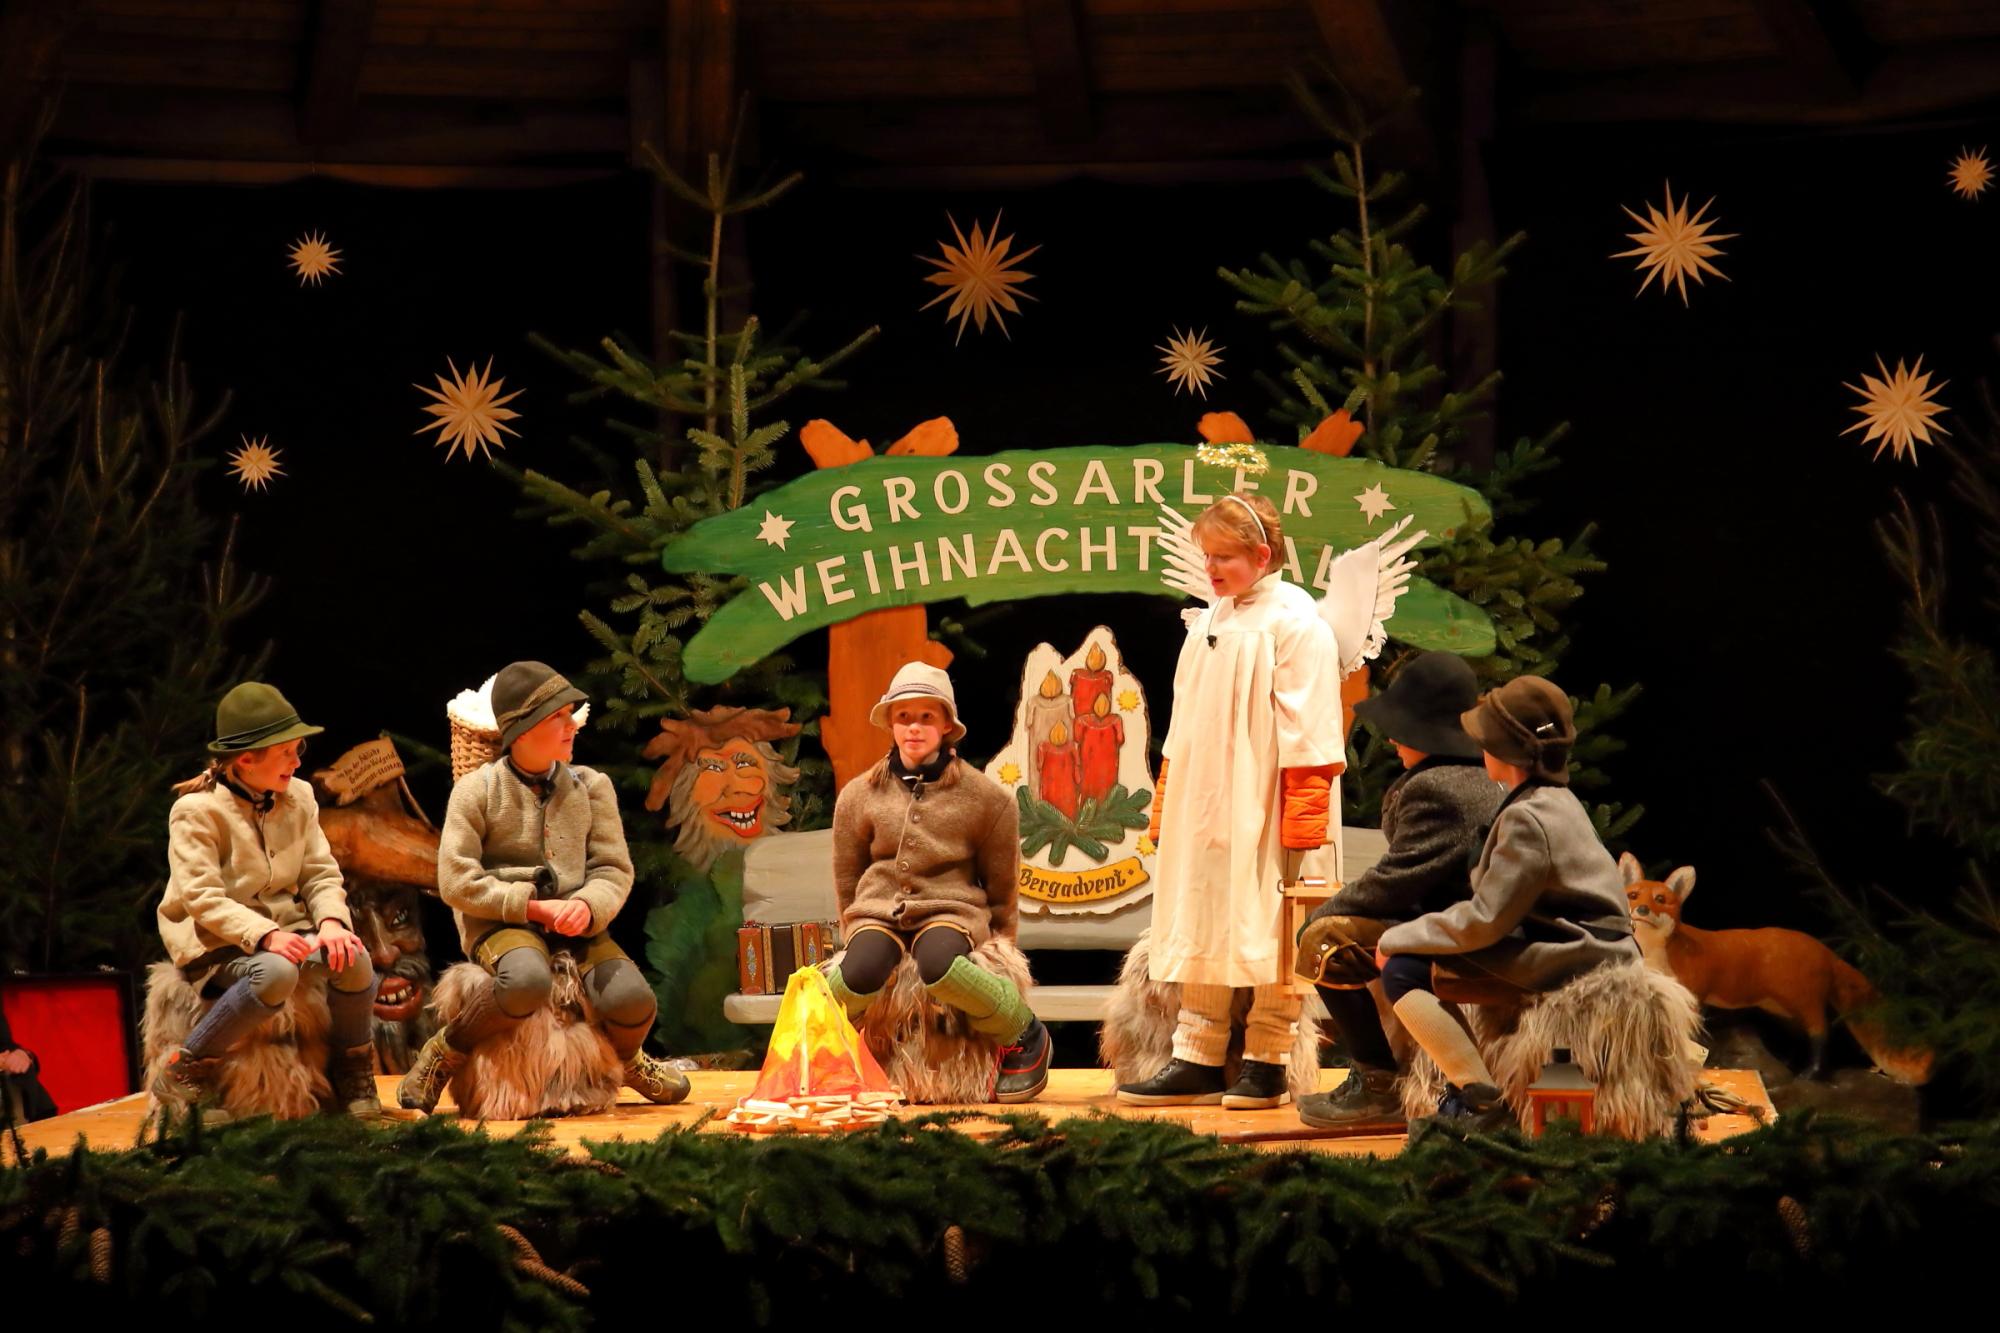 Teatro dei pastori a Grossarl